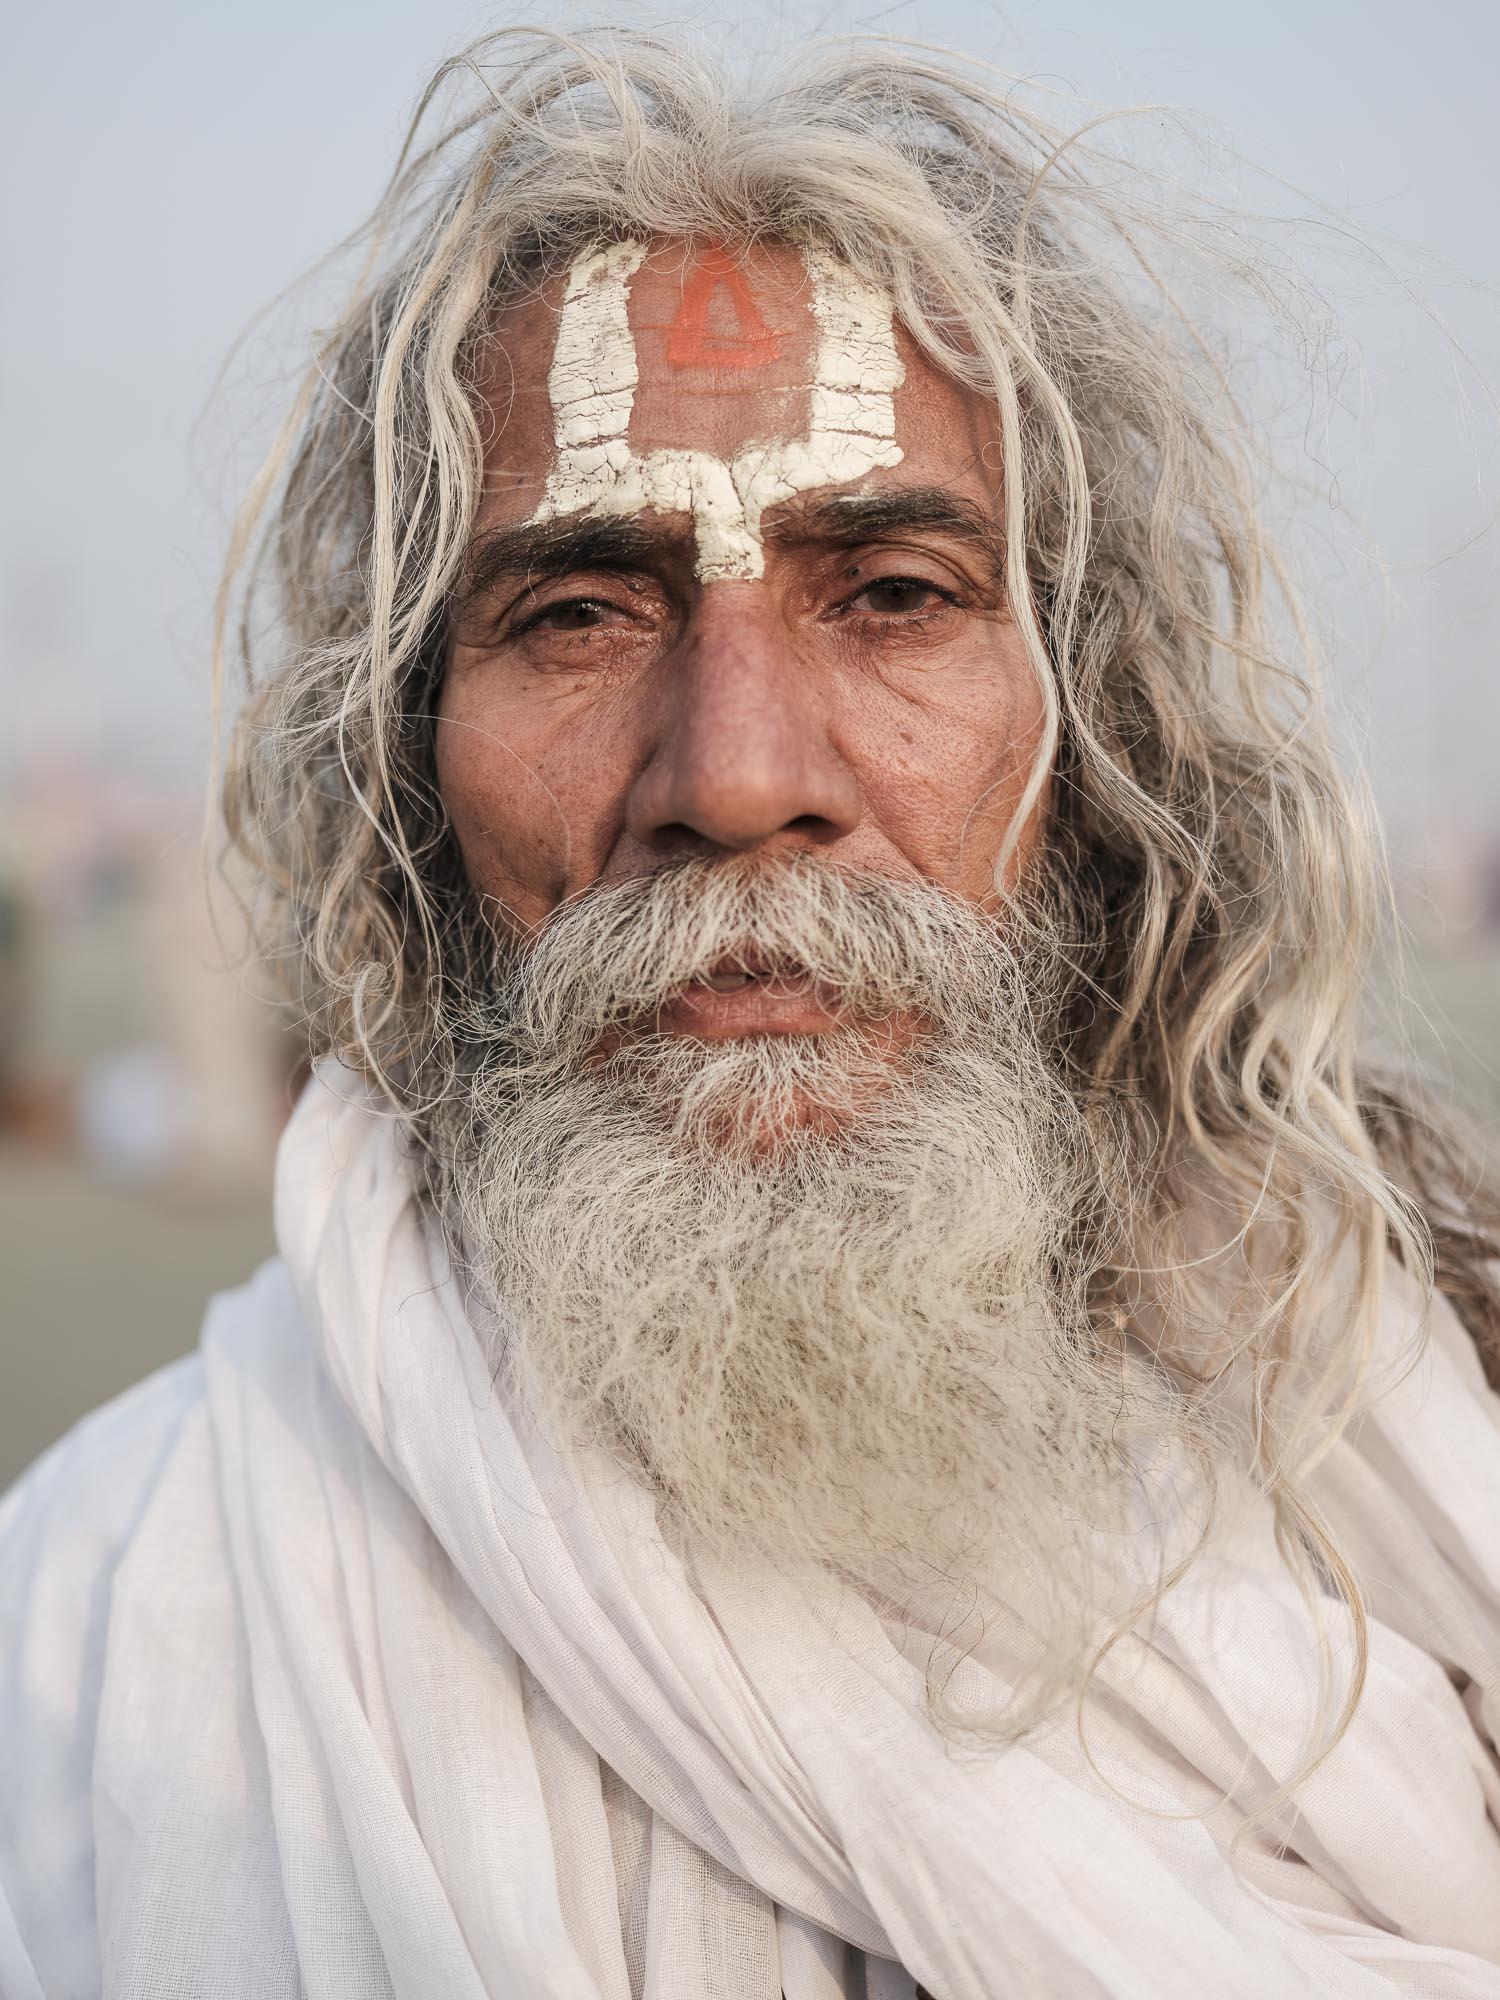 portrait man beard long hair pilgrims Kumbh mela 2019 India Allahabad Prayagraj Ardh hindu religious Festival event rivers photographer jose jeuland photography